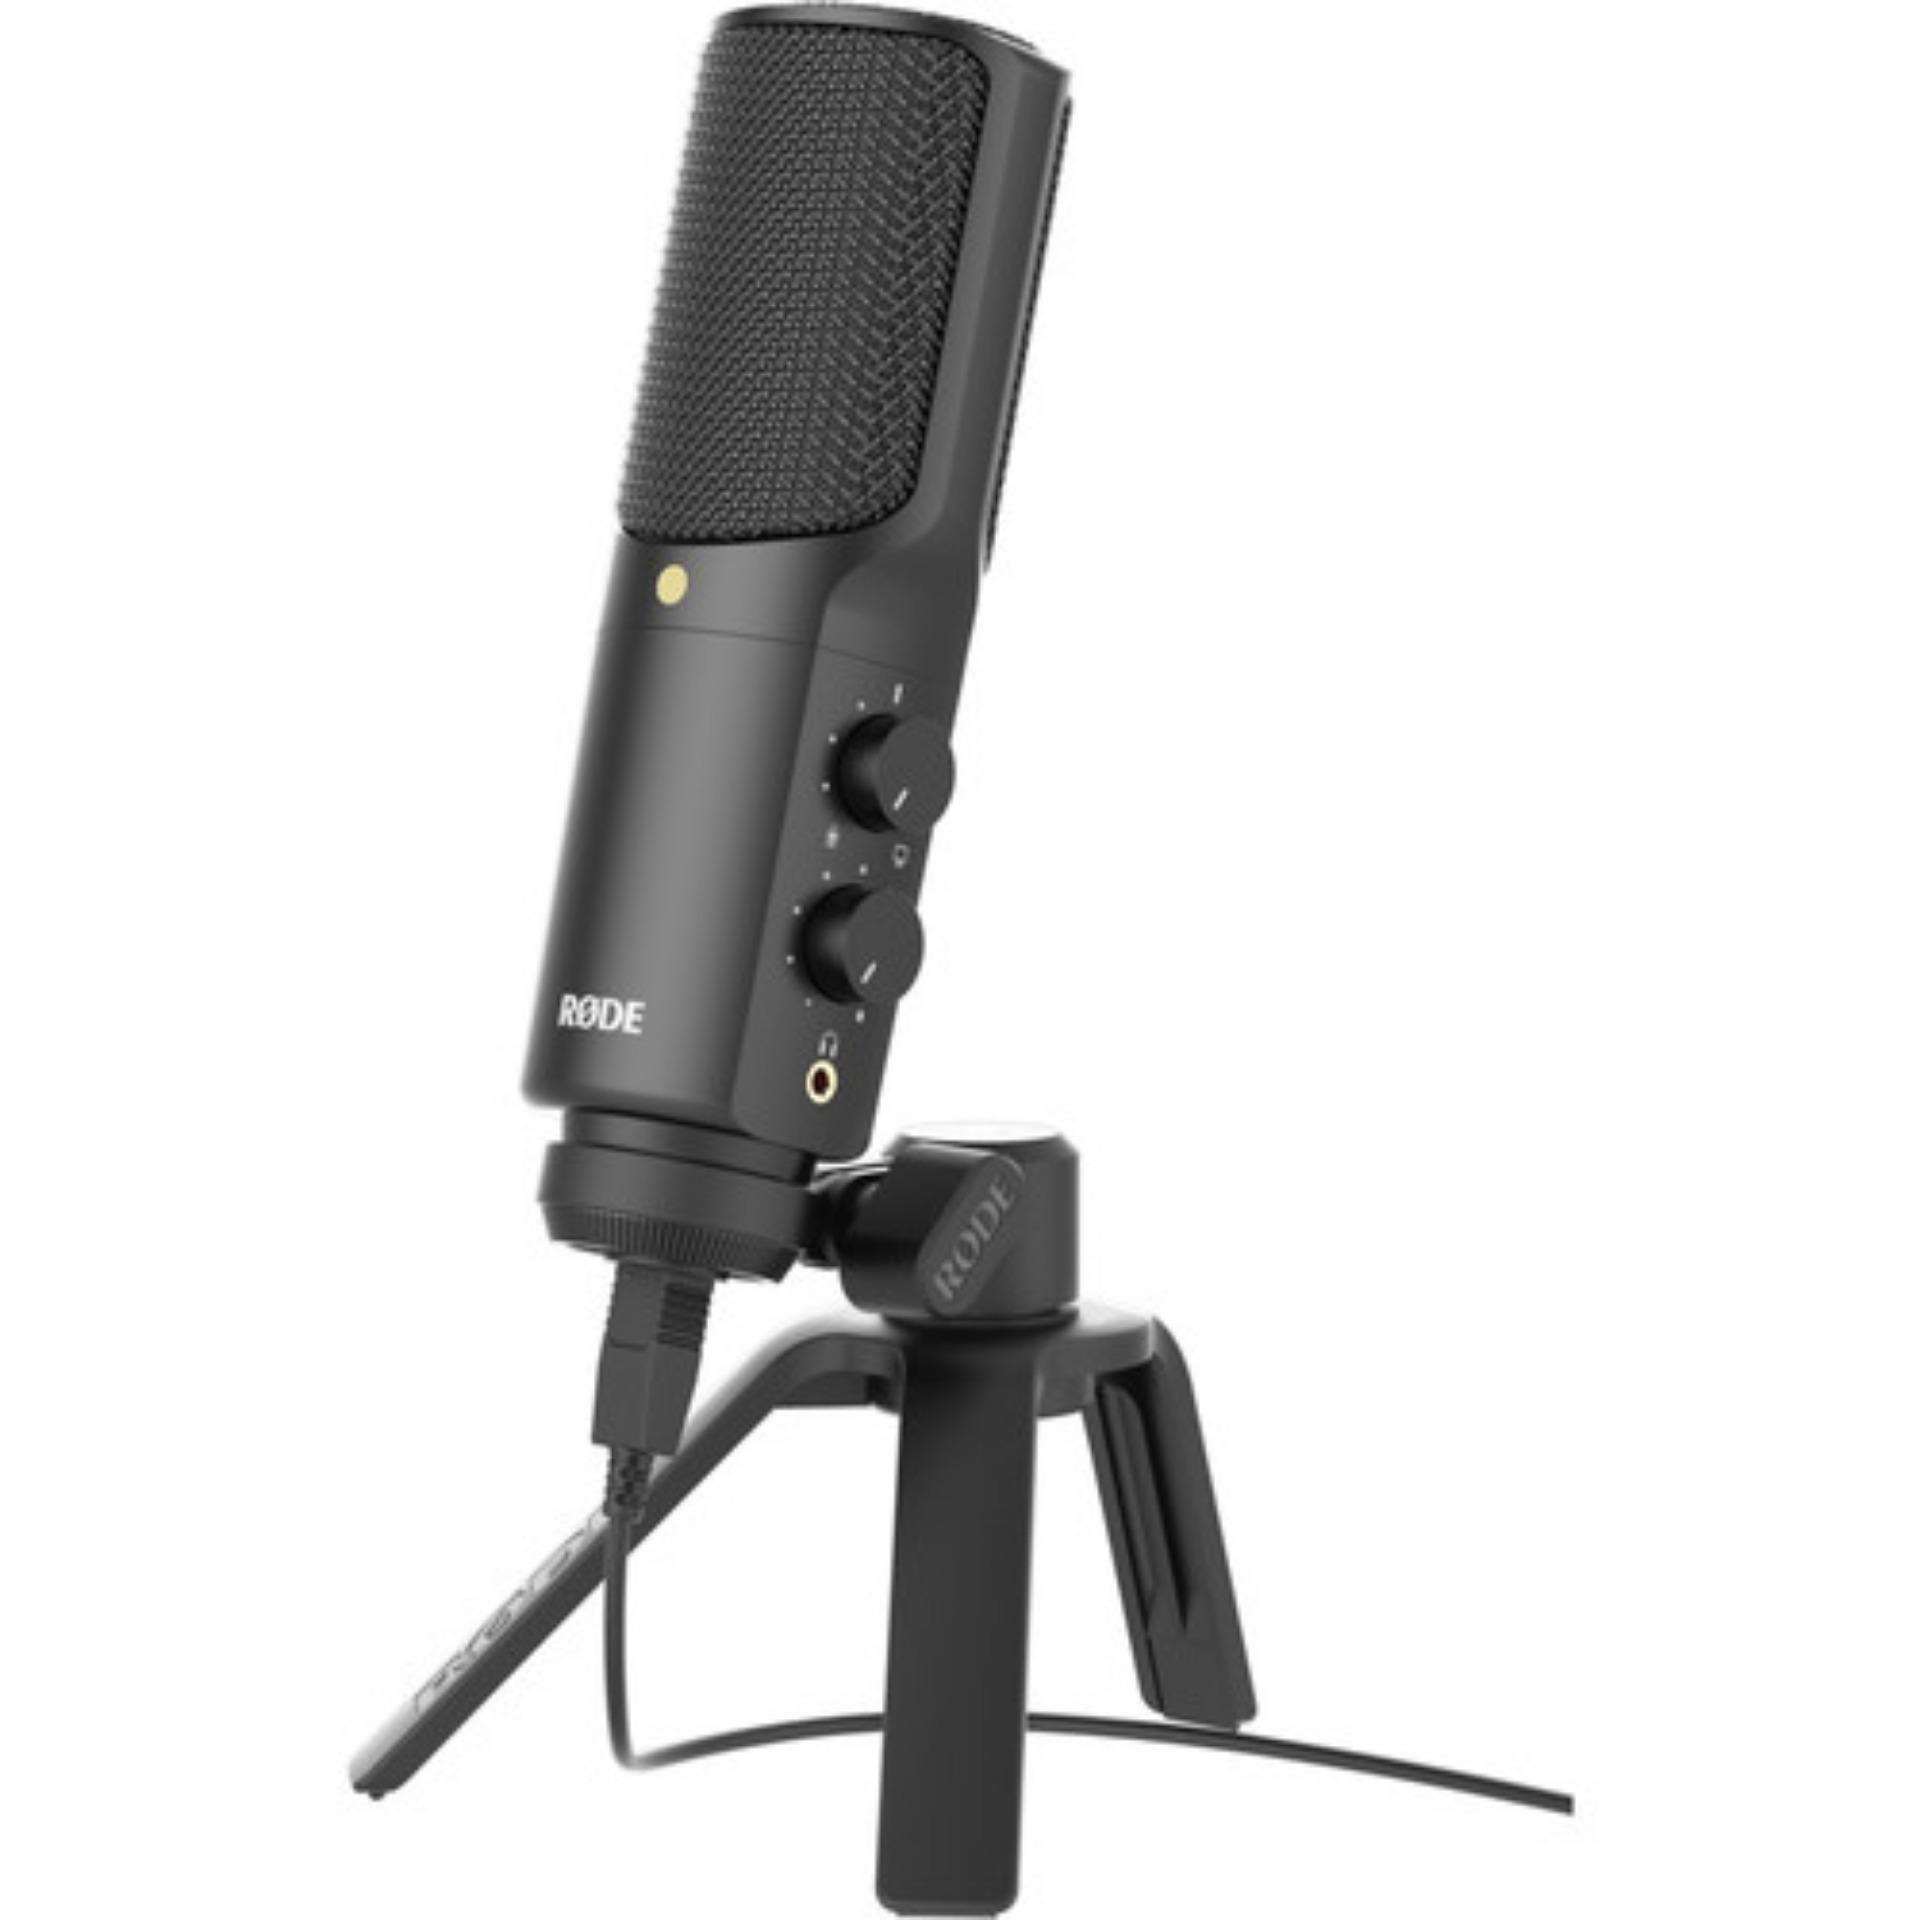 Harga Rode Nt Usb Versatile Studio Quality Usb Microphone Termurah